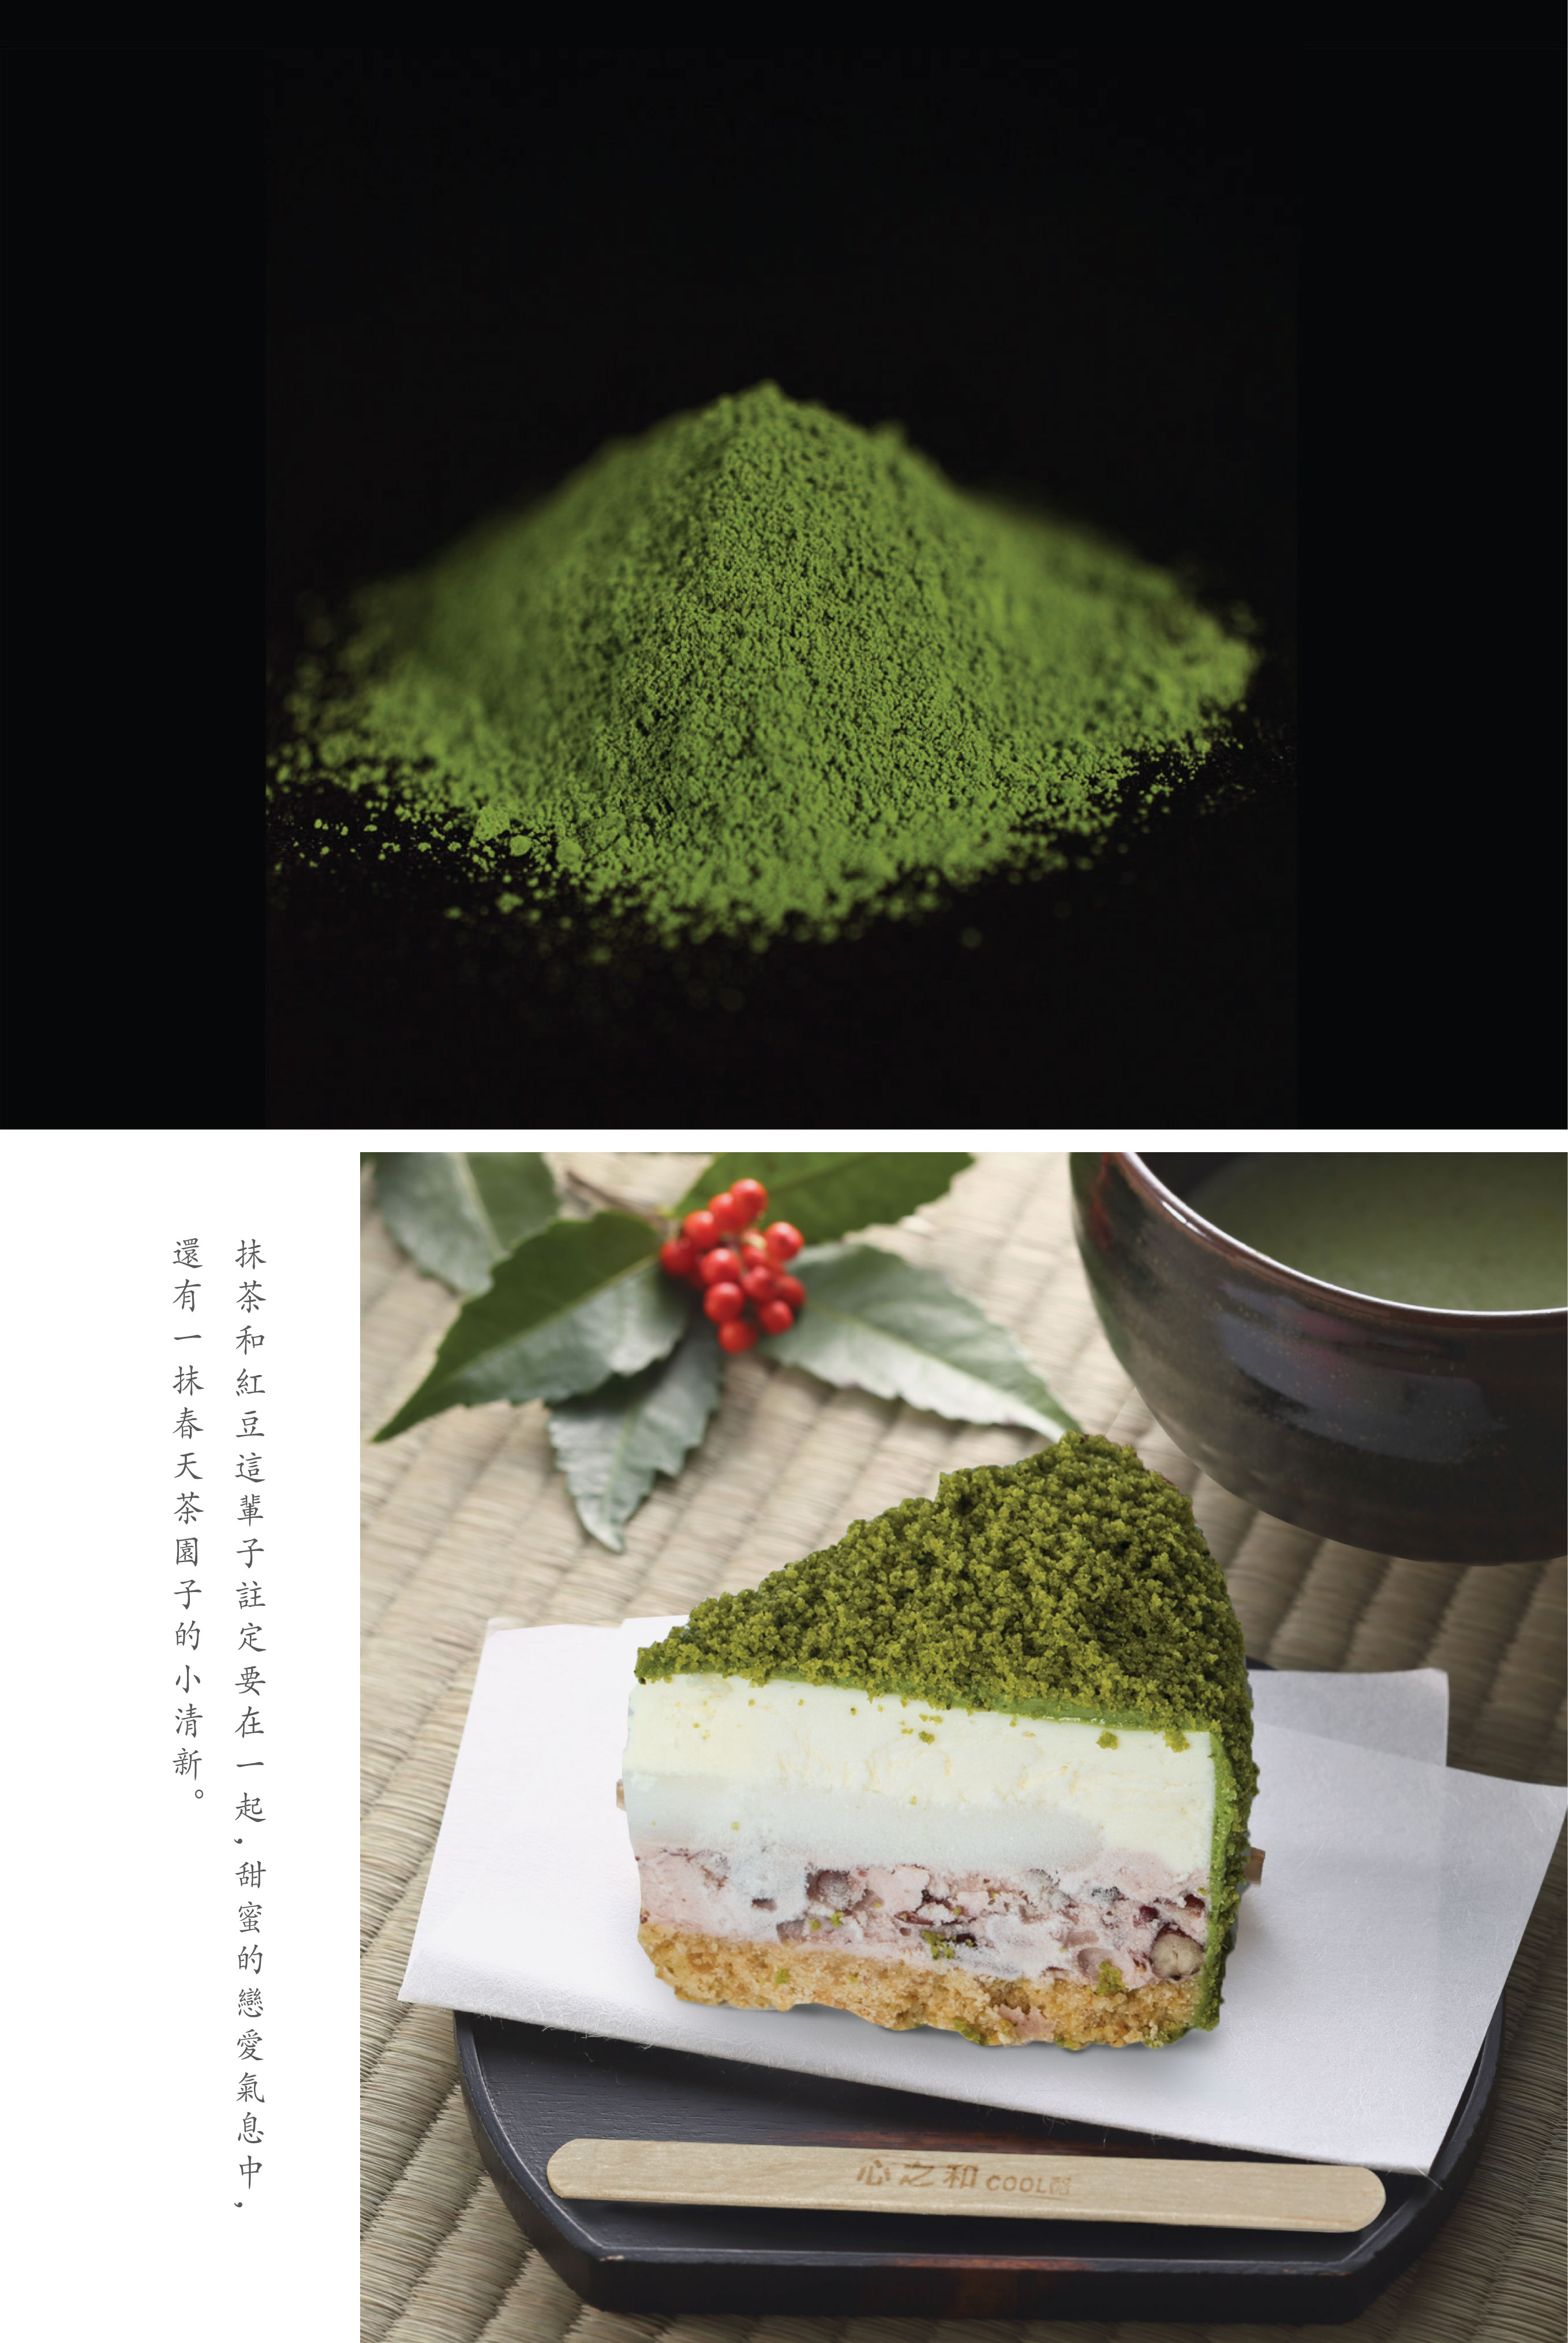 抹茶爱红豆 Matcha Cool Cheese 08